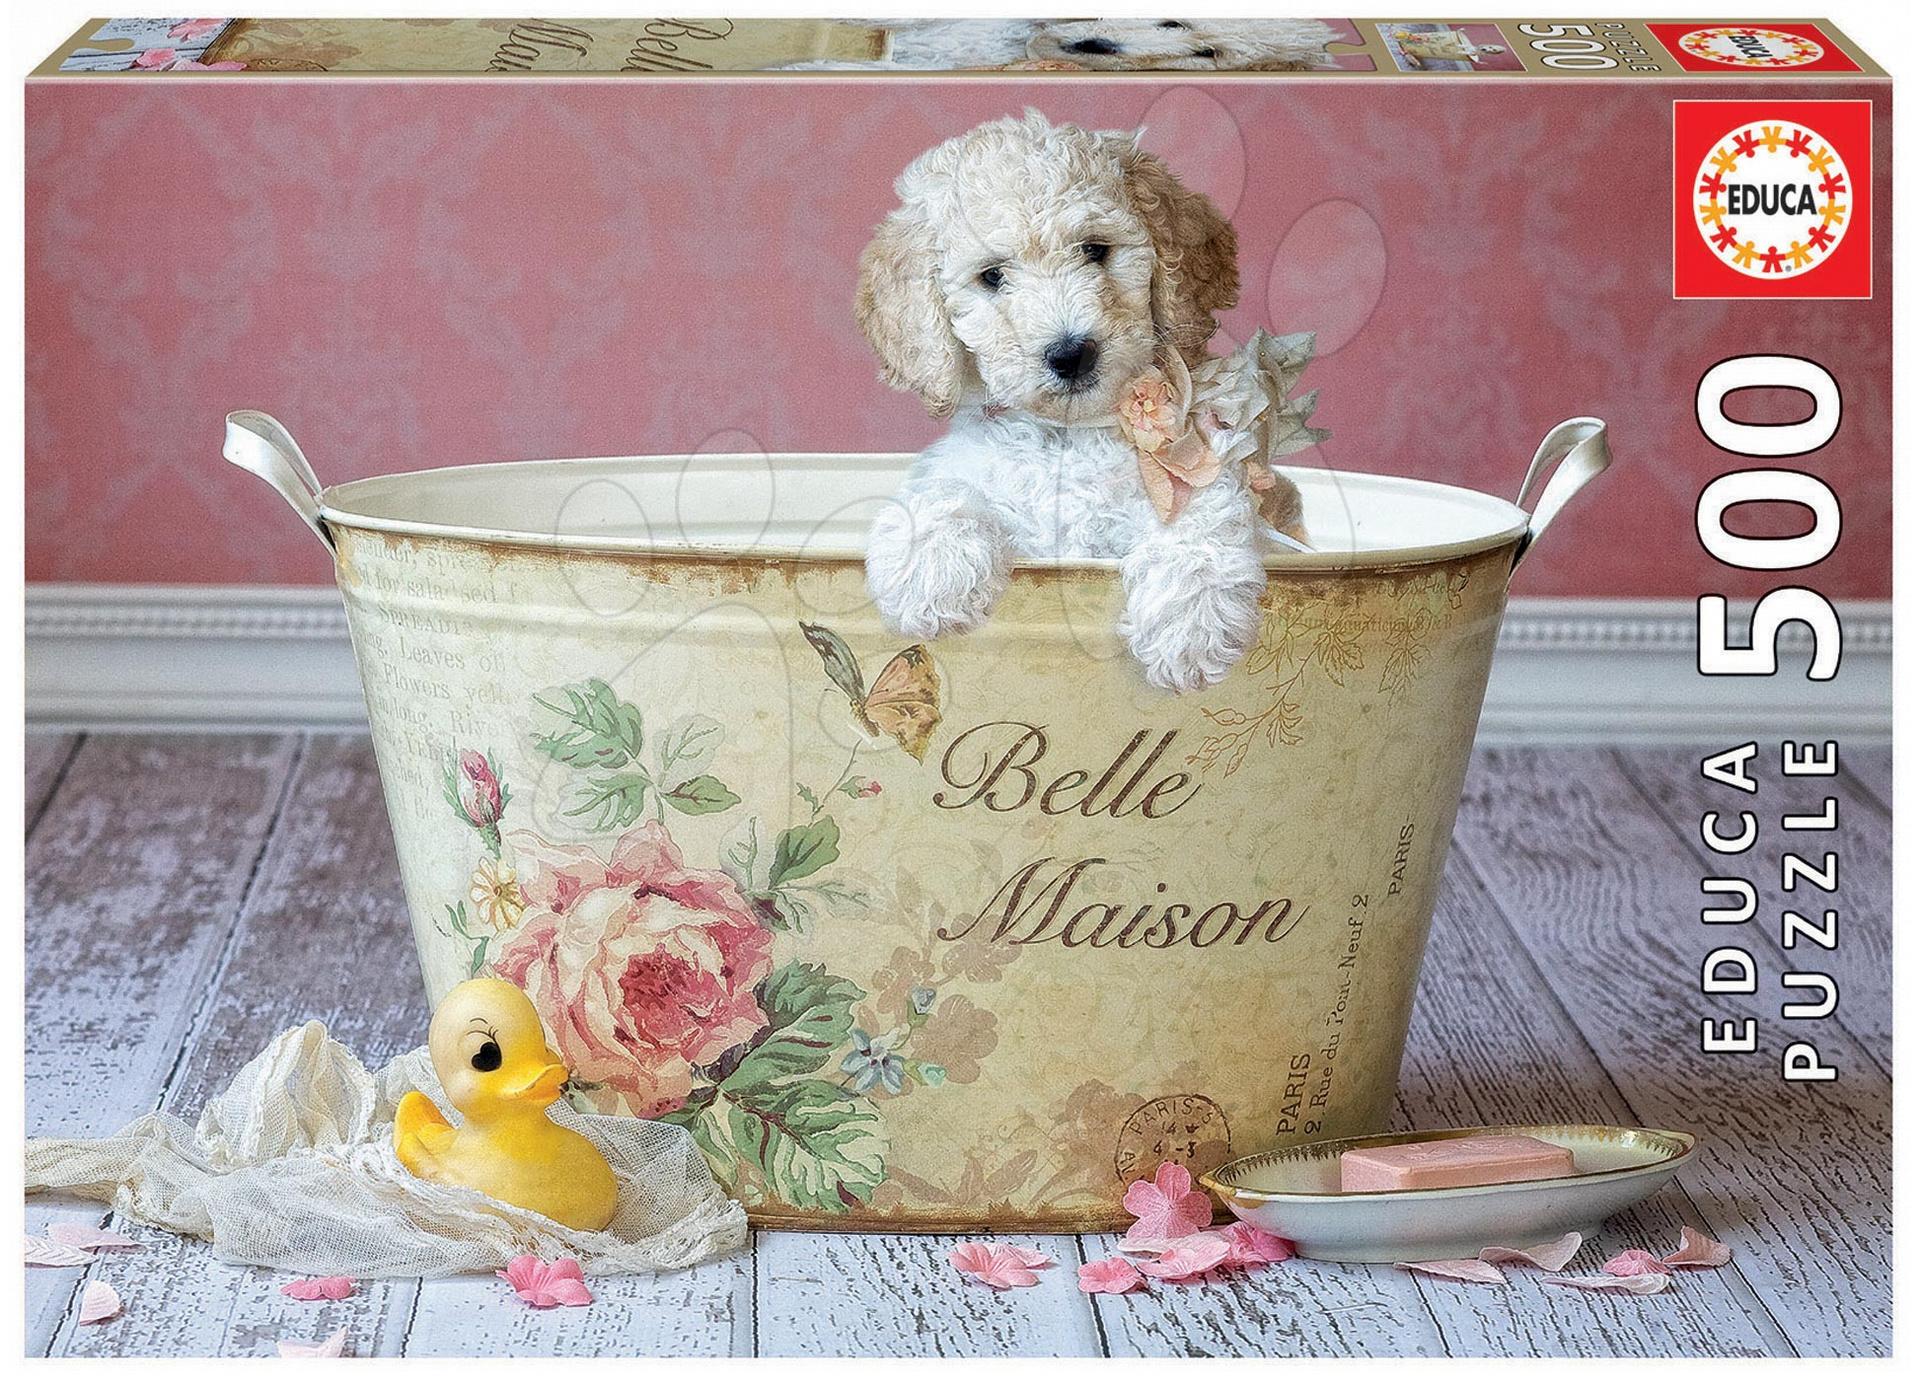 Puzzle 500 dielne - Puzzle Genuine Belle Maison, Lisa Jane Educa 500 dielov od 11 rokov